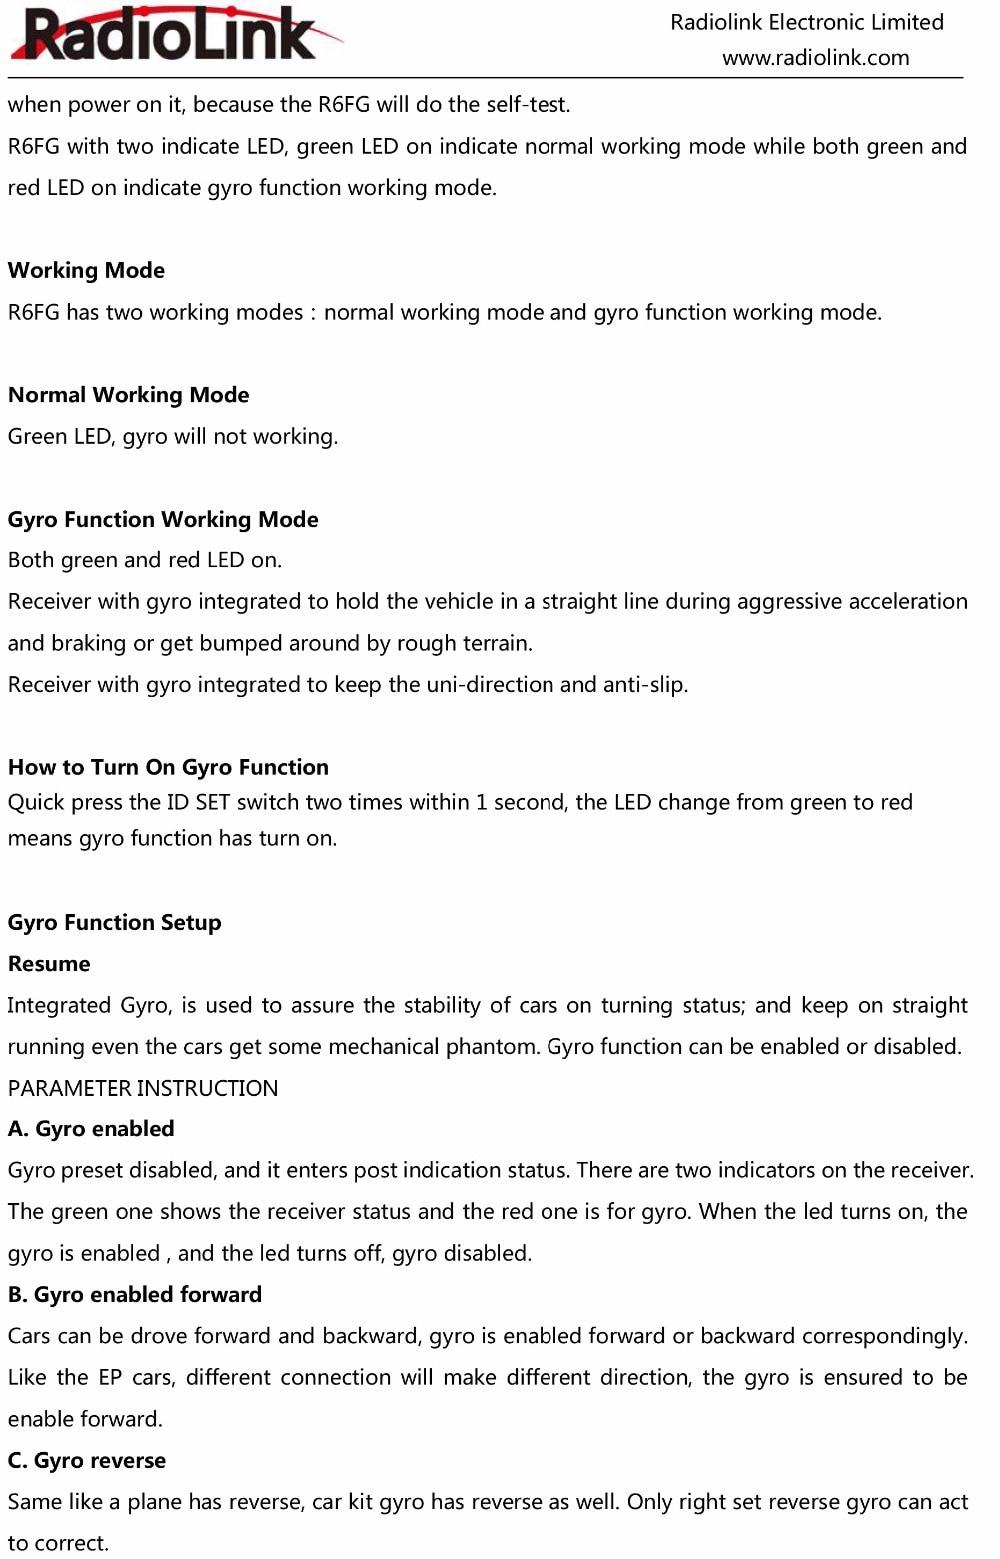 R6FG introduction-2017.12